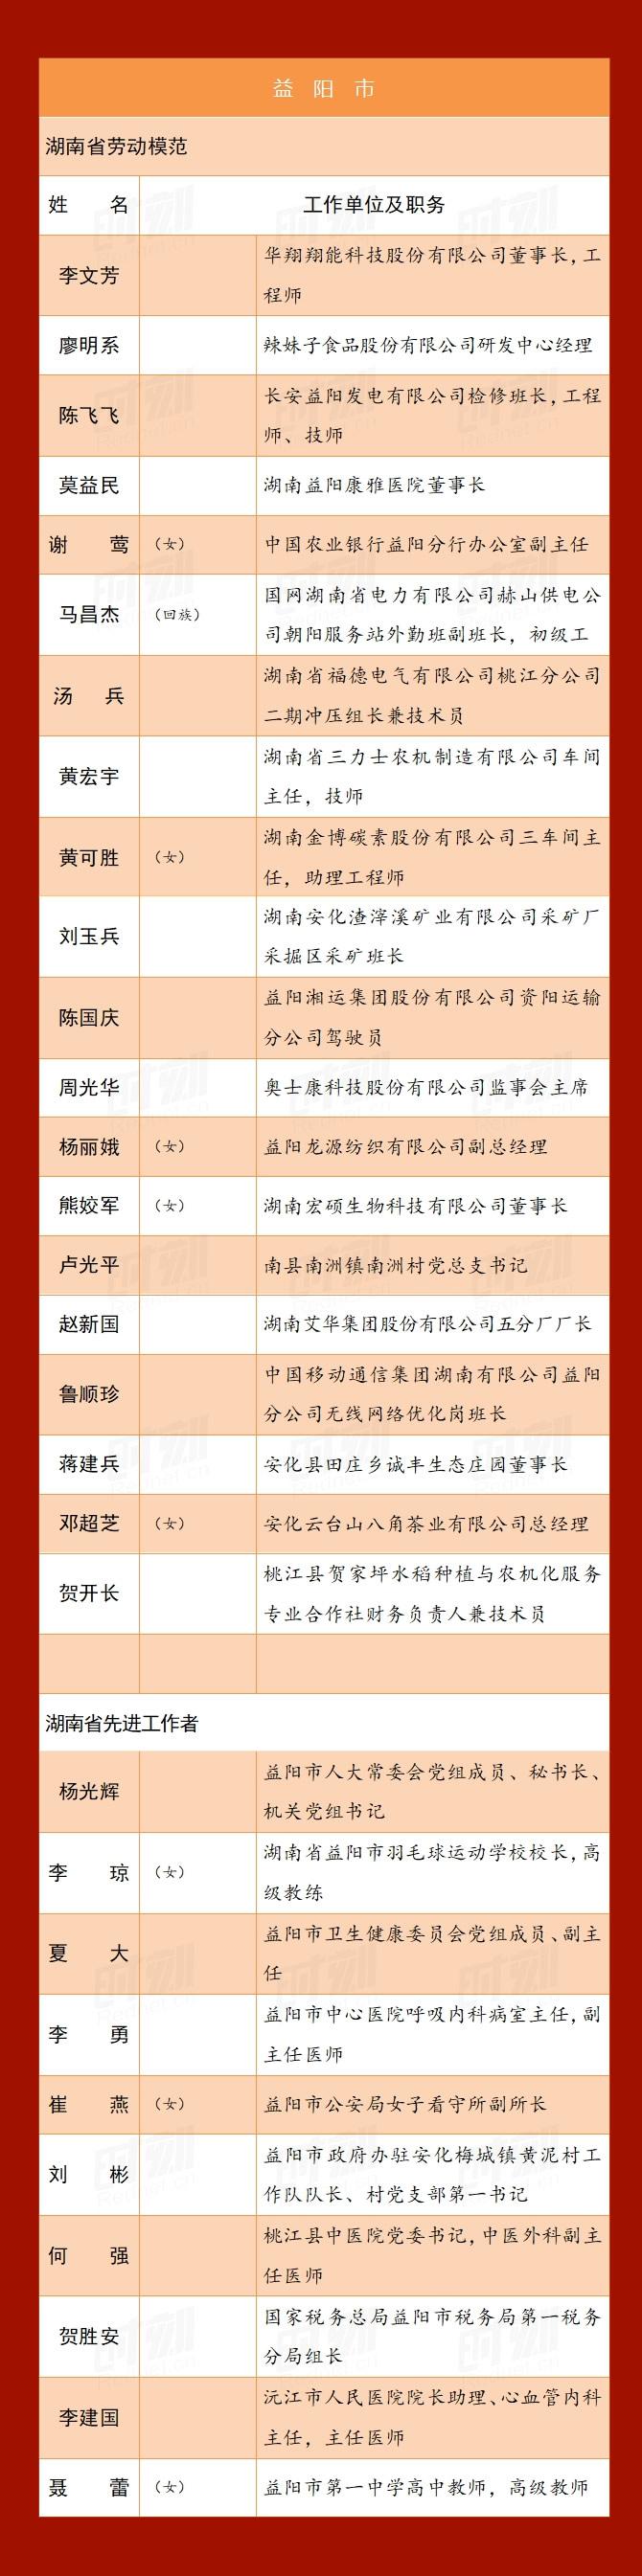 a9益阳_r1_c1.jpg